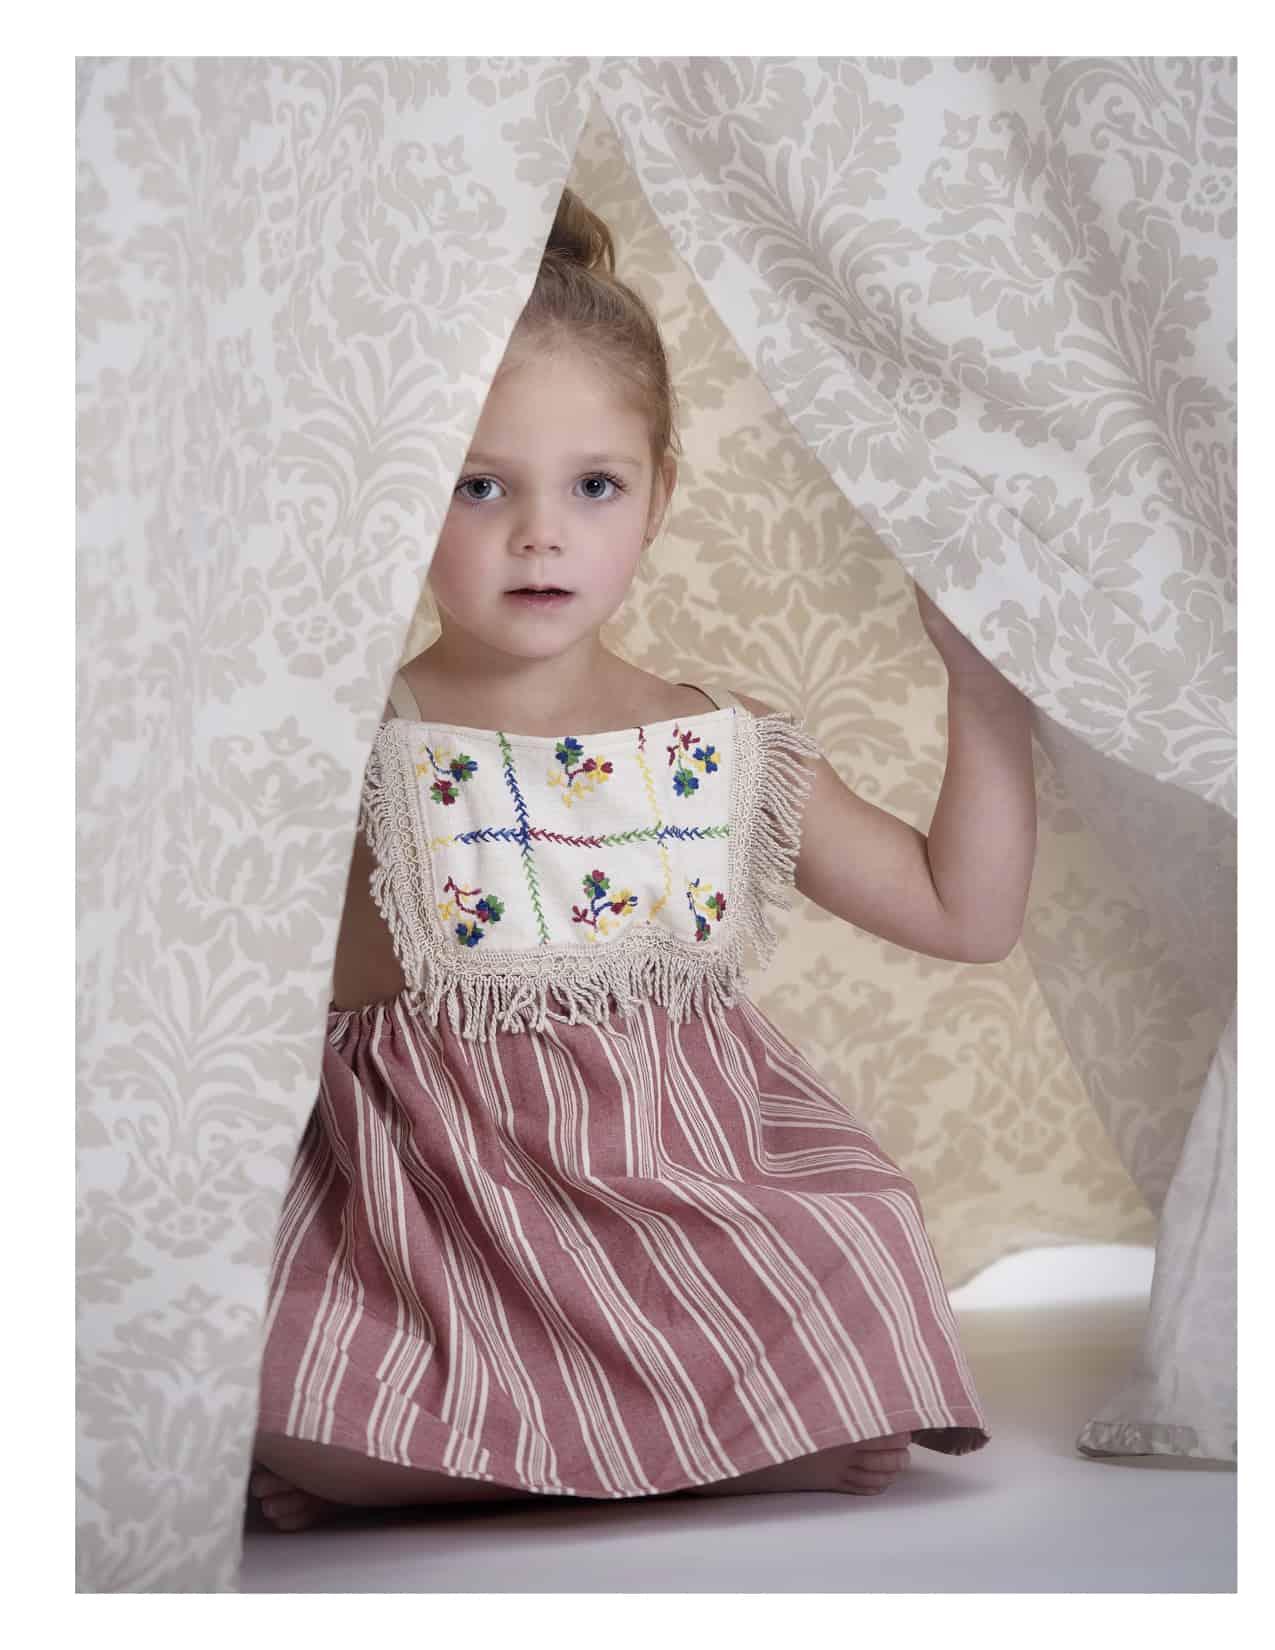 Child Model5